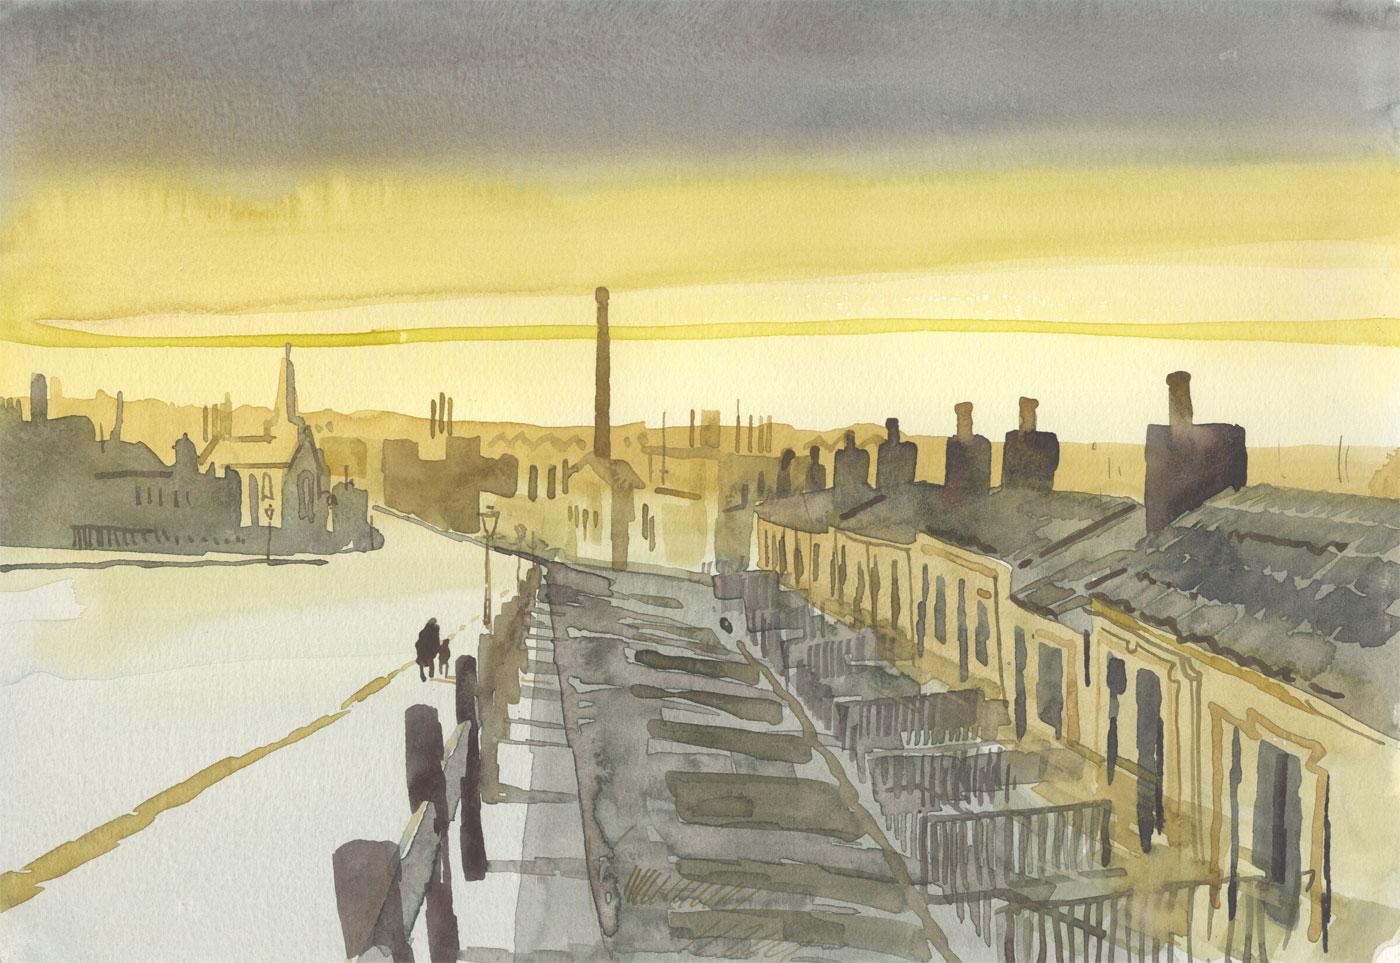 Robert T. Blayney (1929-2016) - Mid 20th Century Watercolour, Yellow Skies